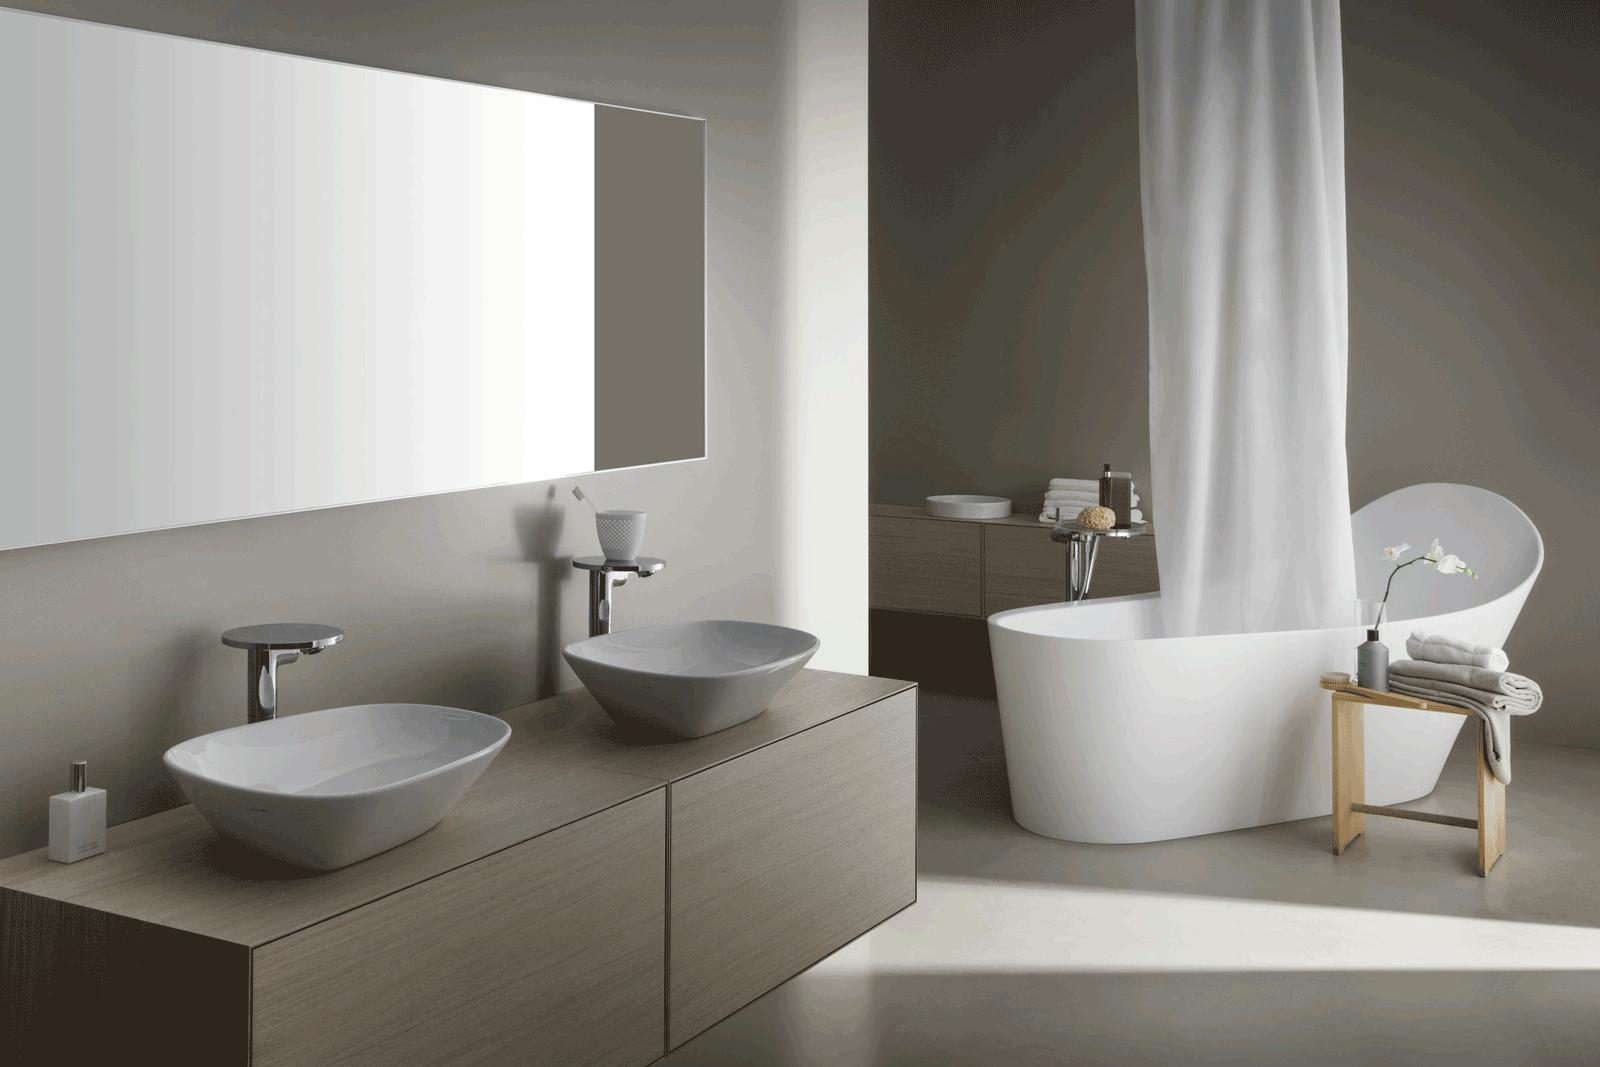 Laufen Bathrooms At Bathline Bathroom Design Northern Ireland in measurements 1600 X 1067